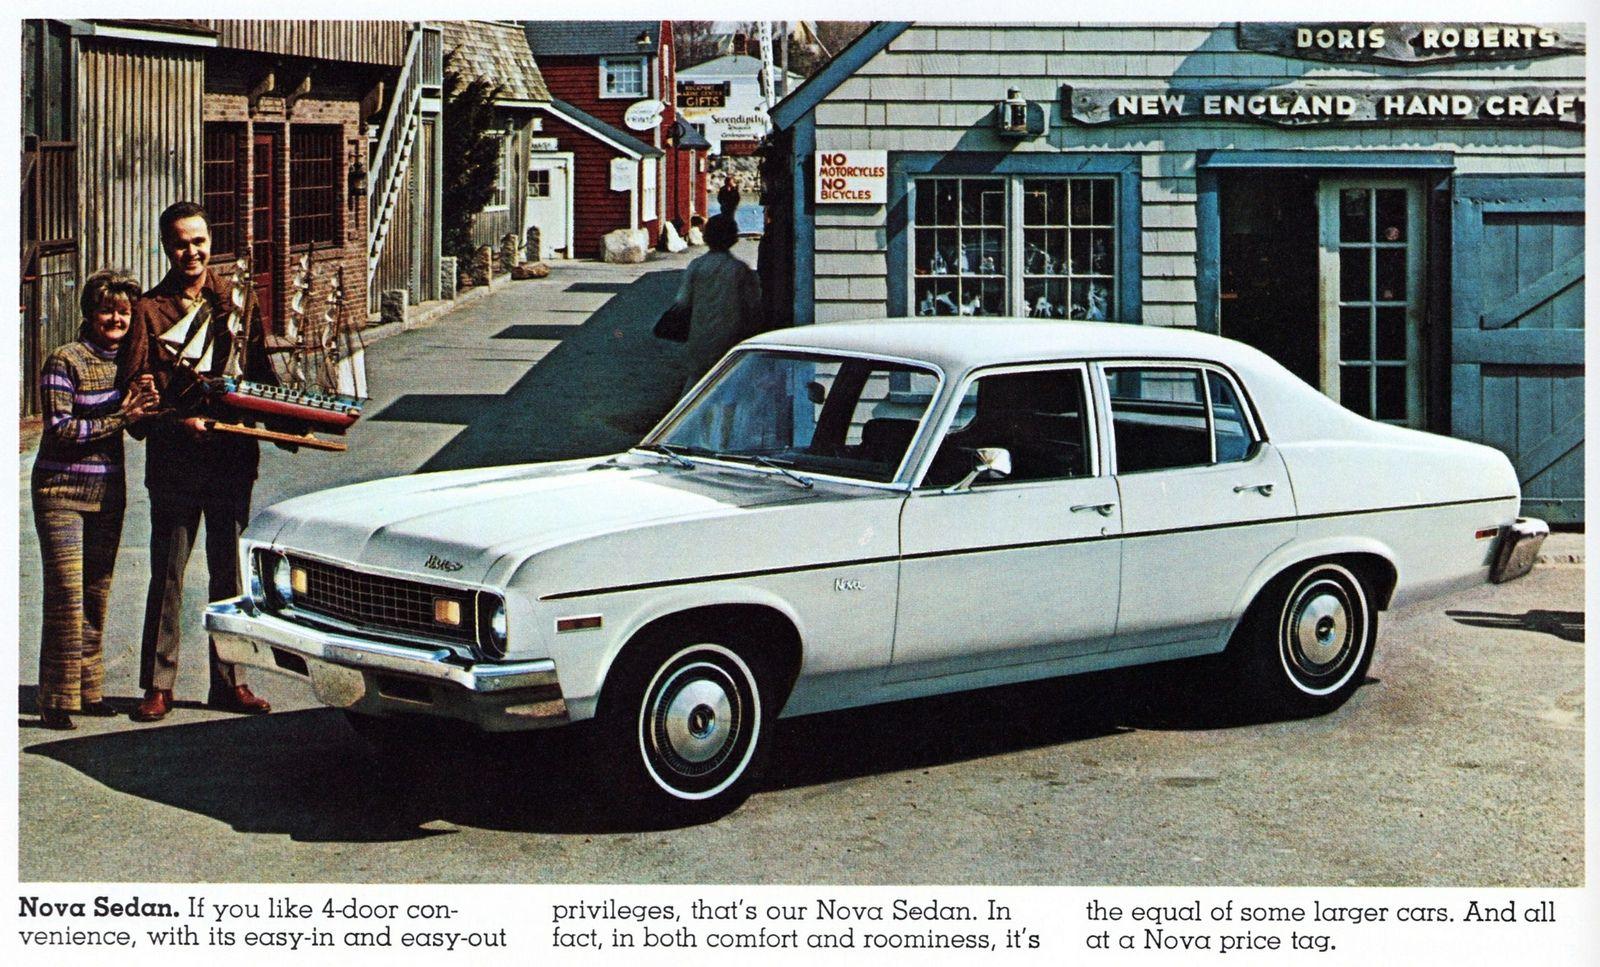 1973 Chevrolet Nova 4 Door Chevrolet Nova Chevrolet Chevy Nova